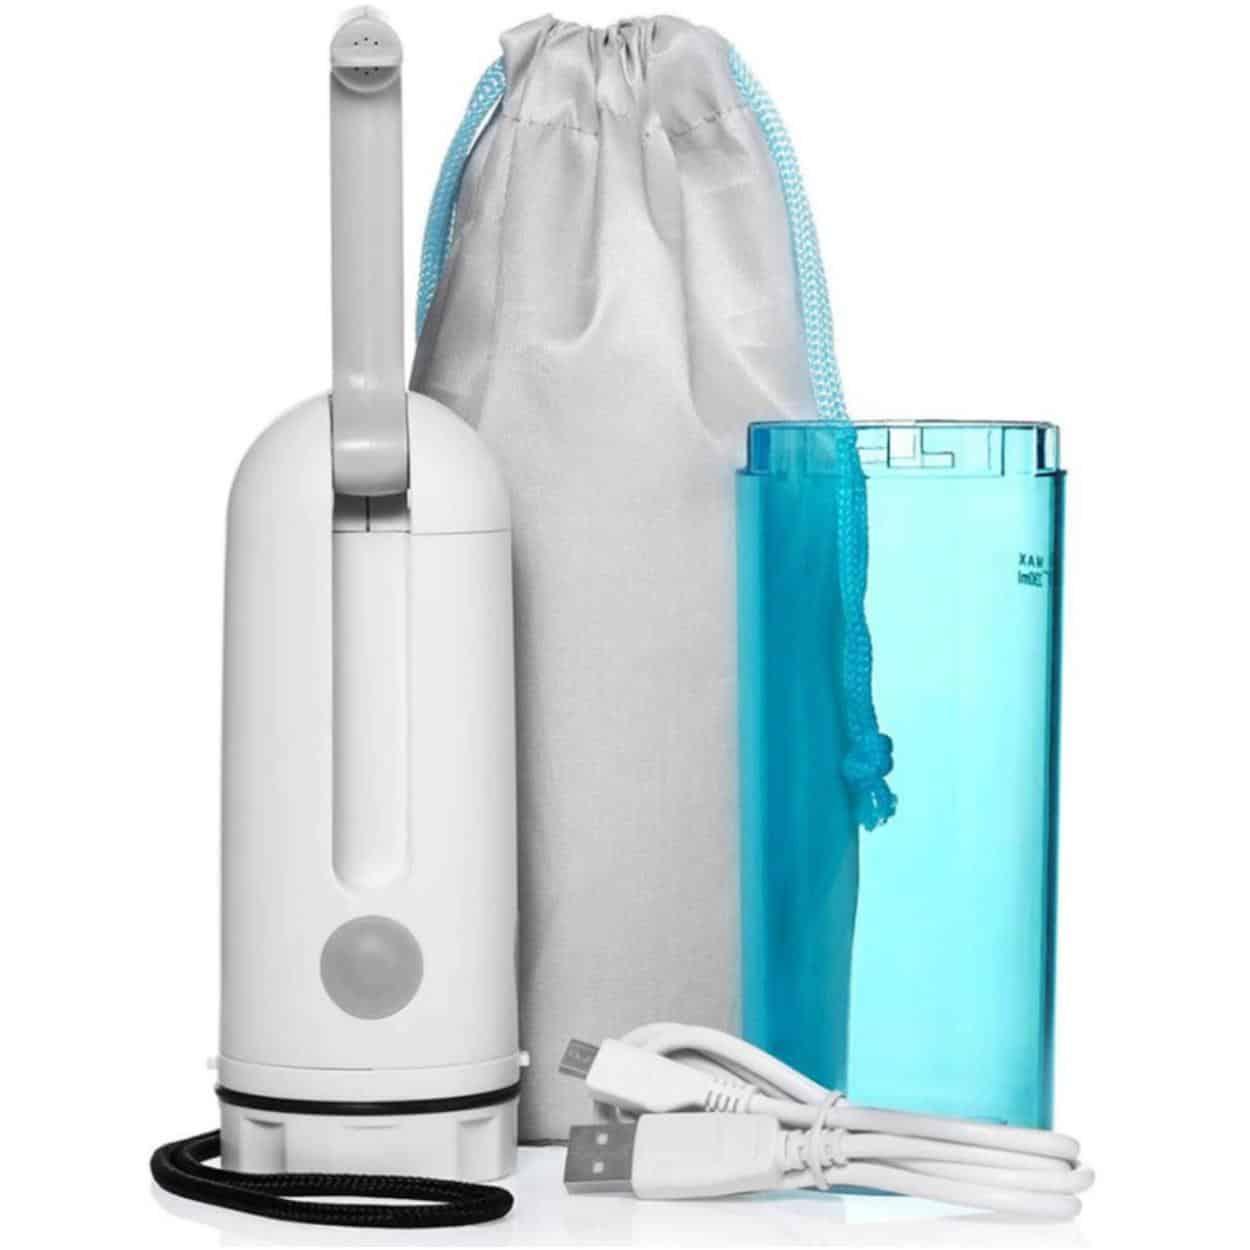 portable electric bidet travel shattaf